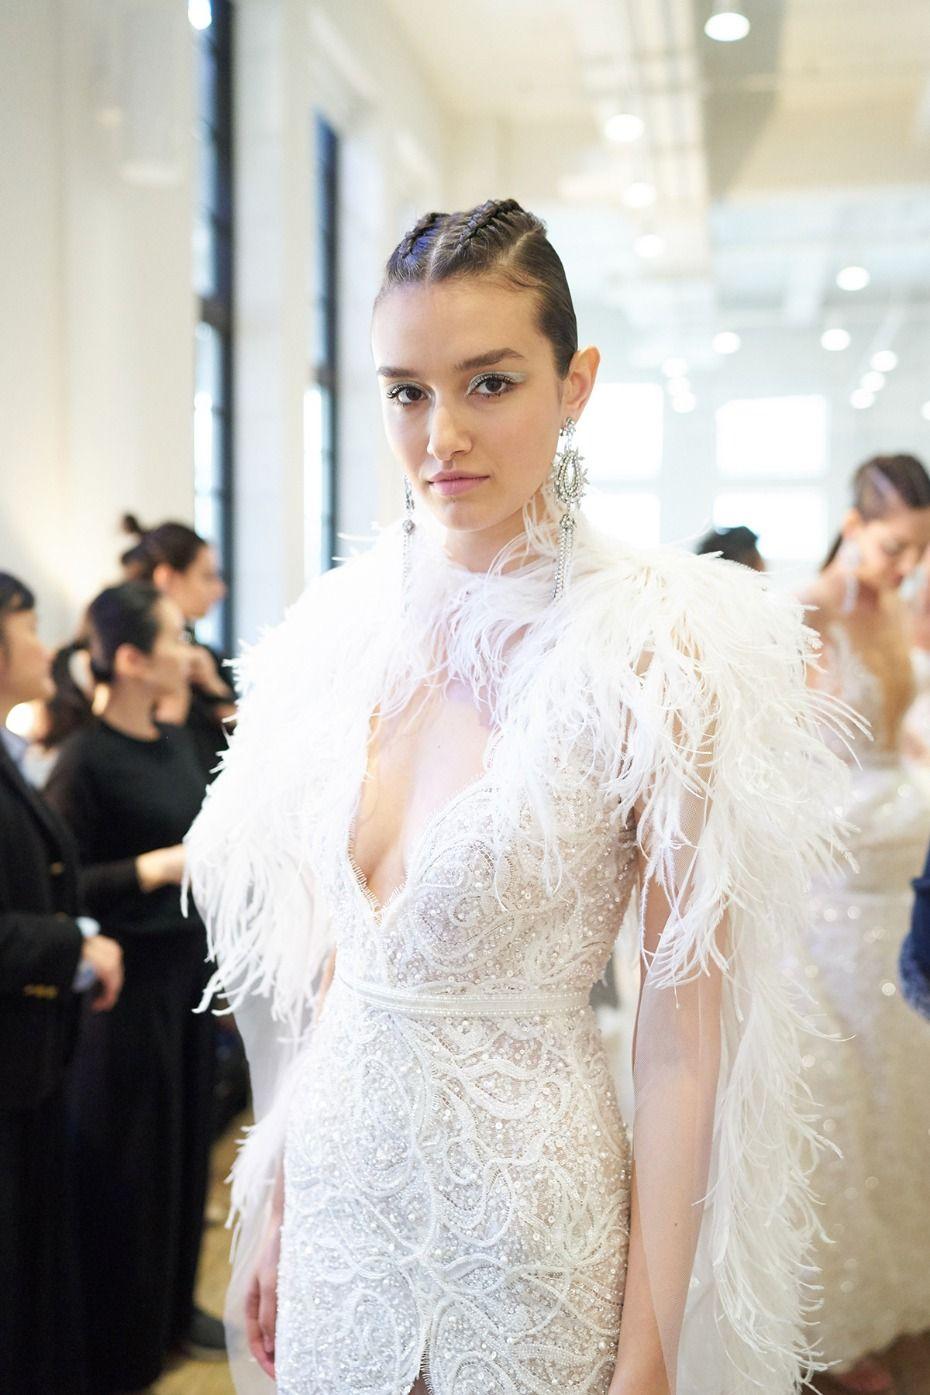 Lace over tulle wedding dress january 2019 Berta SpringSummer   Bridal dresses Wedding dress and Weddings